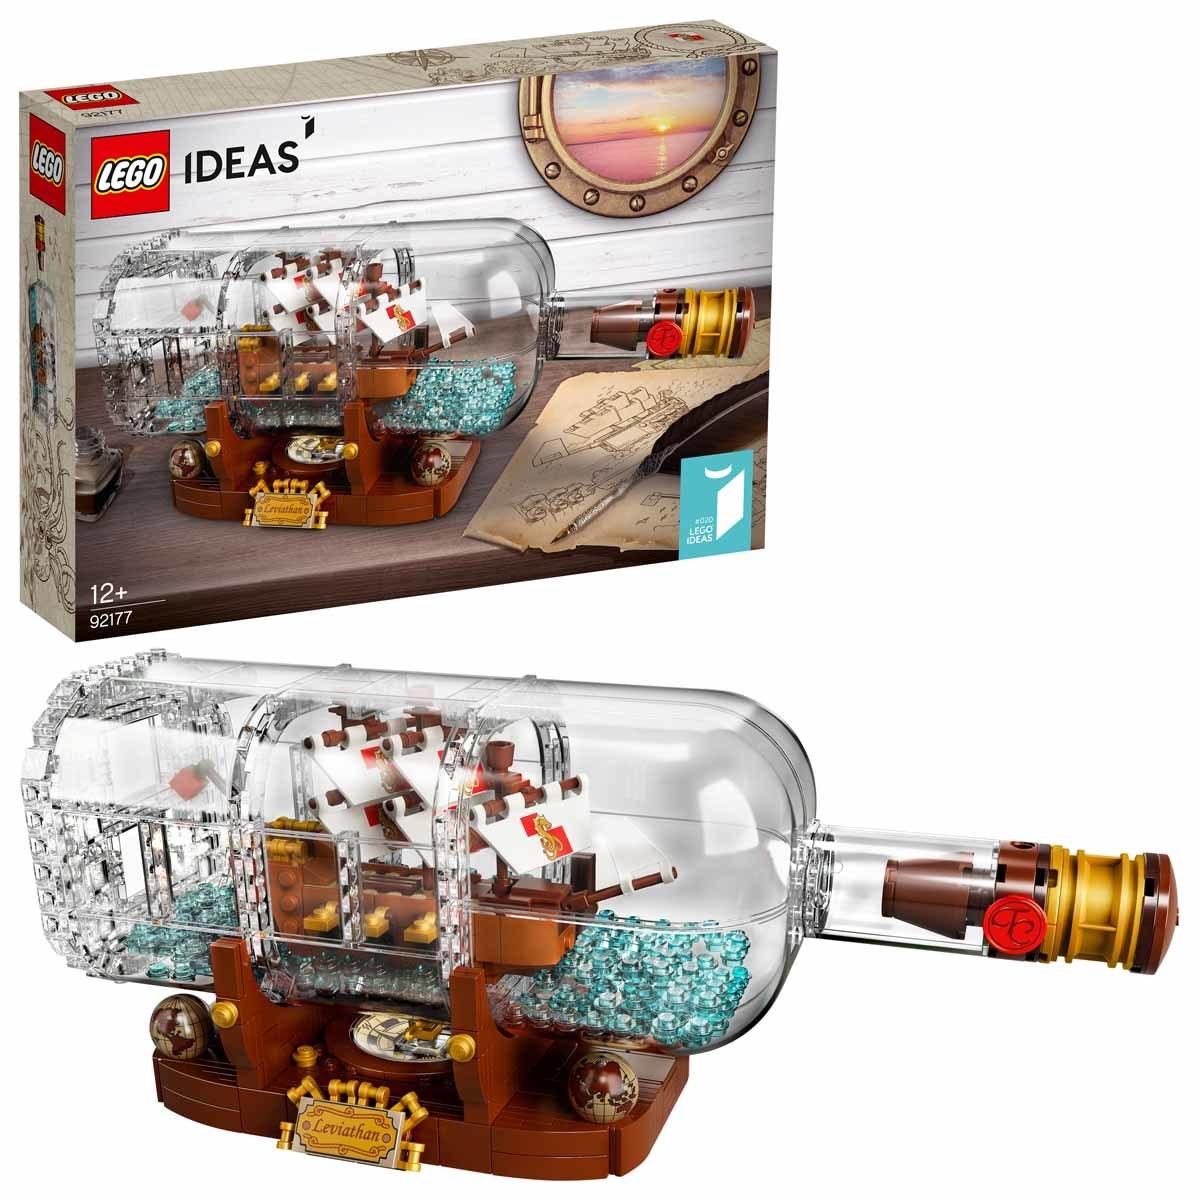 Lego Ideas: Ship in a Bottle image